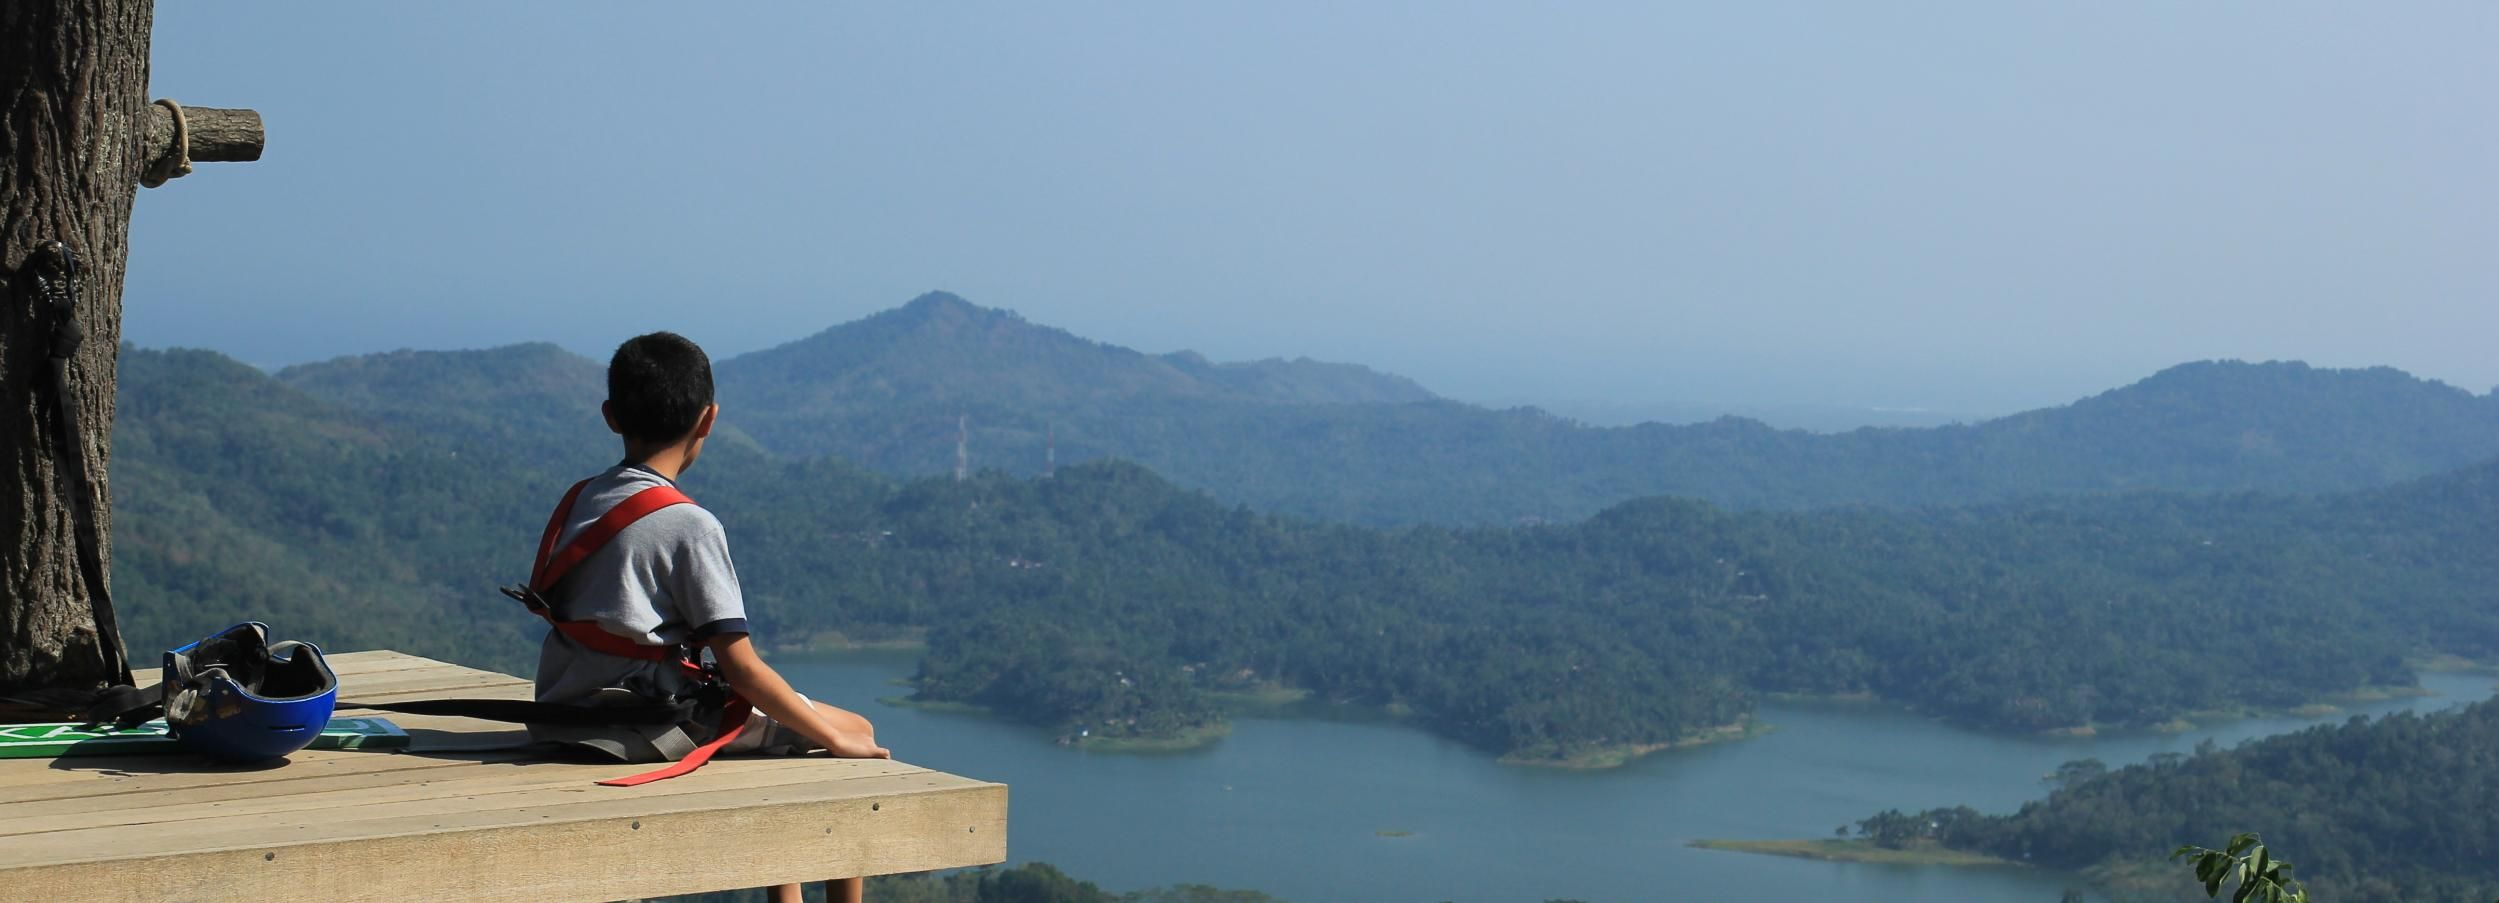 From Yogyakarta: Borobudur & Kalibiru National Park Day Trip